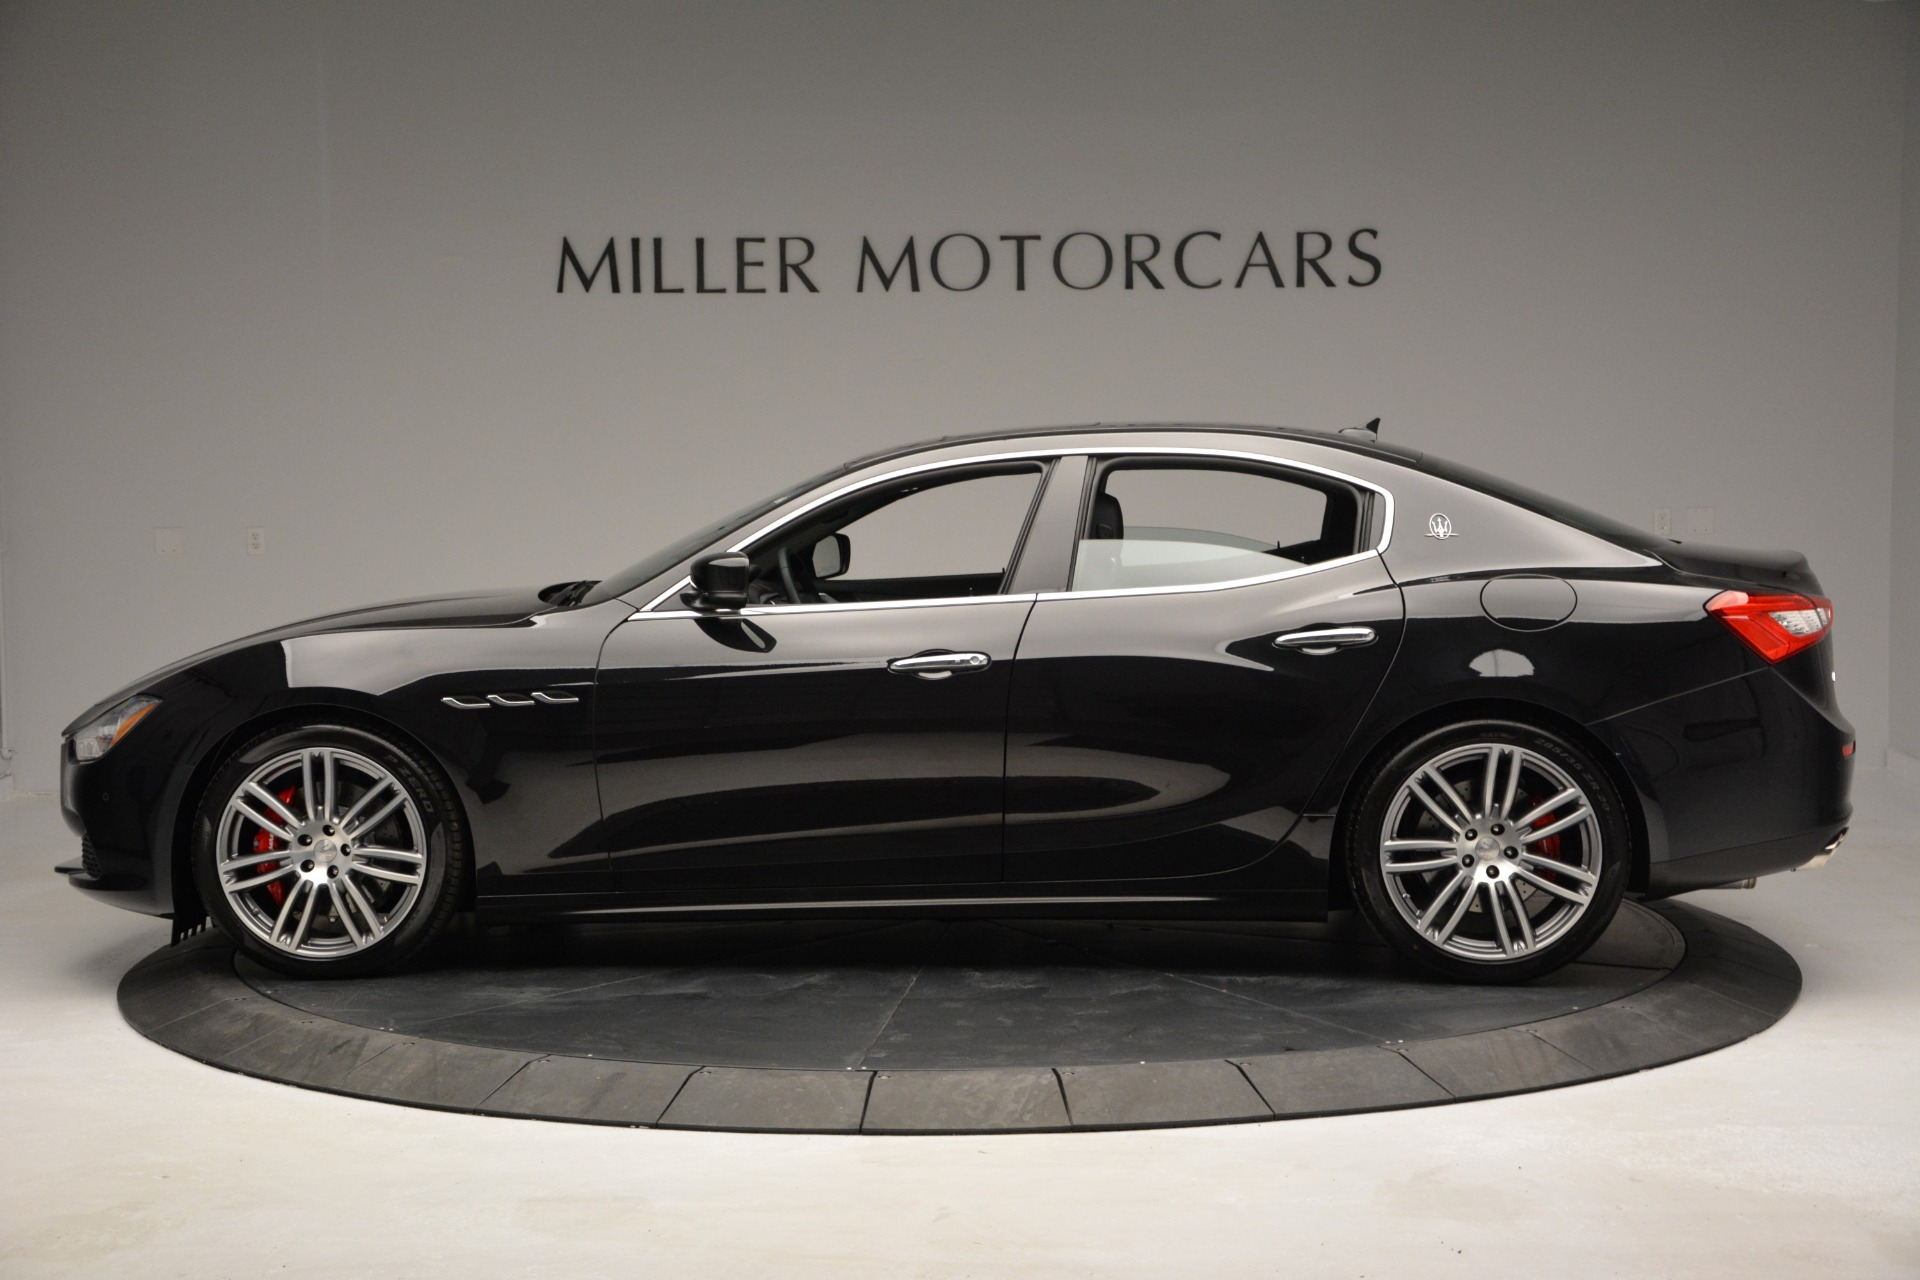 Used 2015 Maserati Ghibli S Q4 For Sale In Greenwich, CT 2070_p3